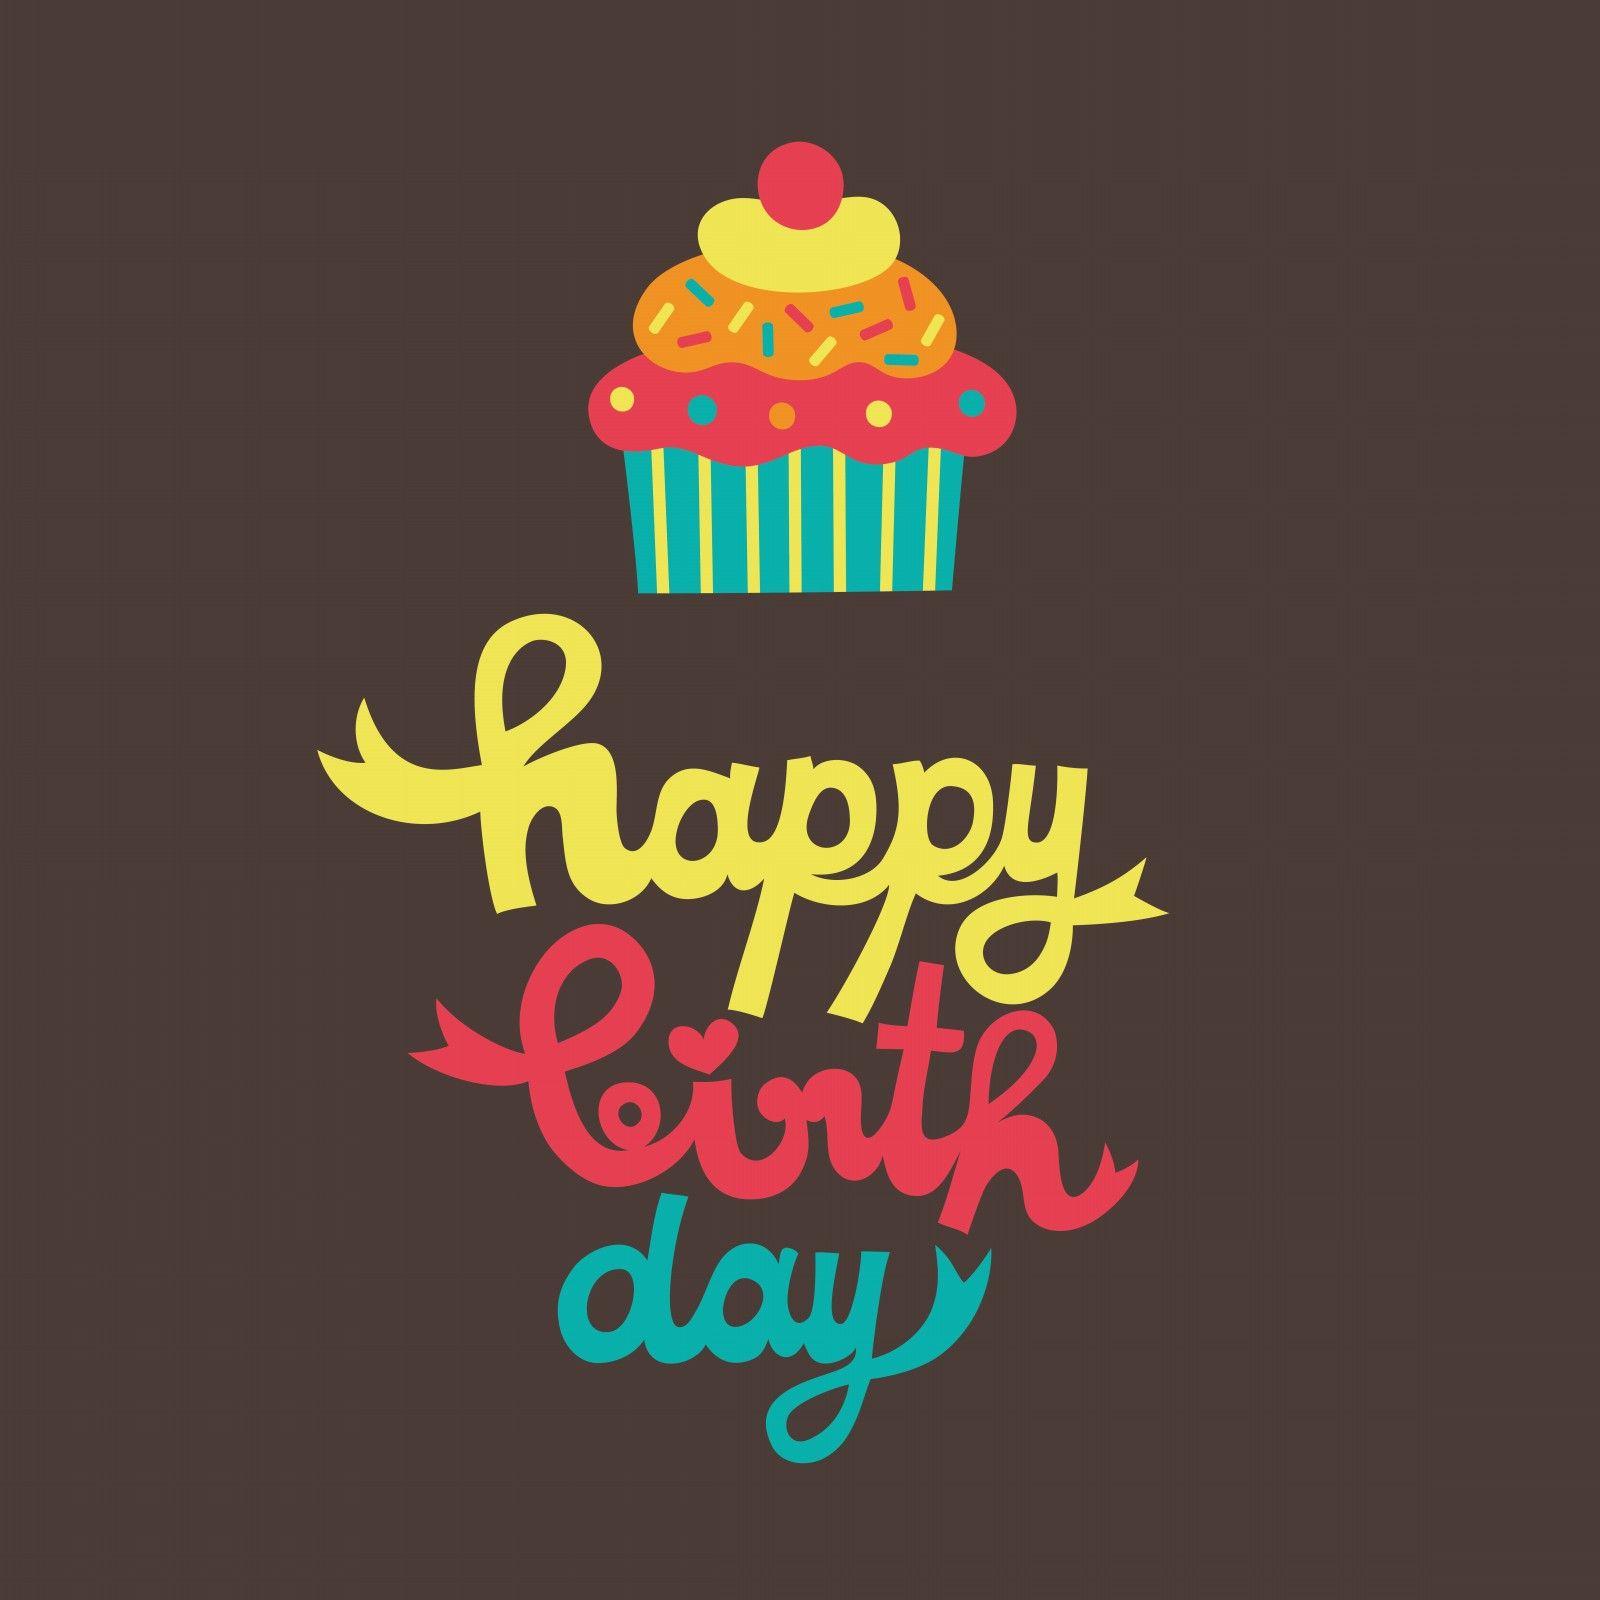 SaraMillerDaughterSilhouetteBirthdayCard364441410074286 – Latest Greeting Cards for Birthday